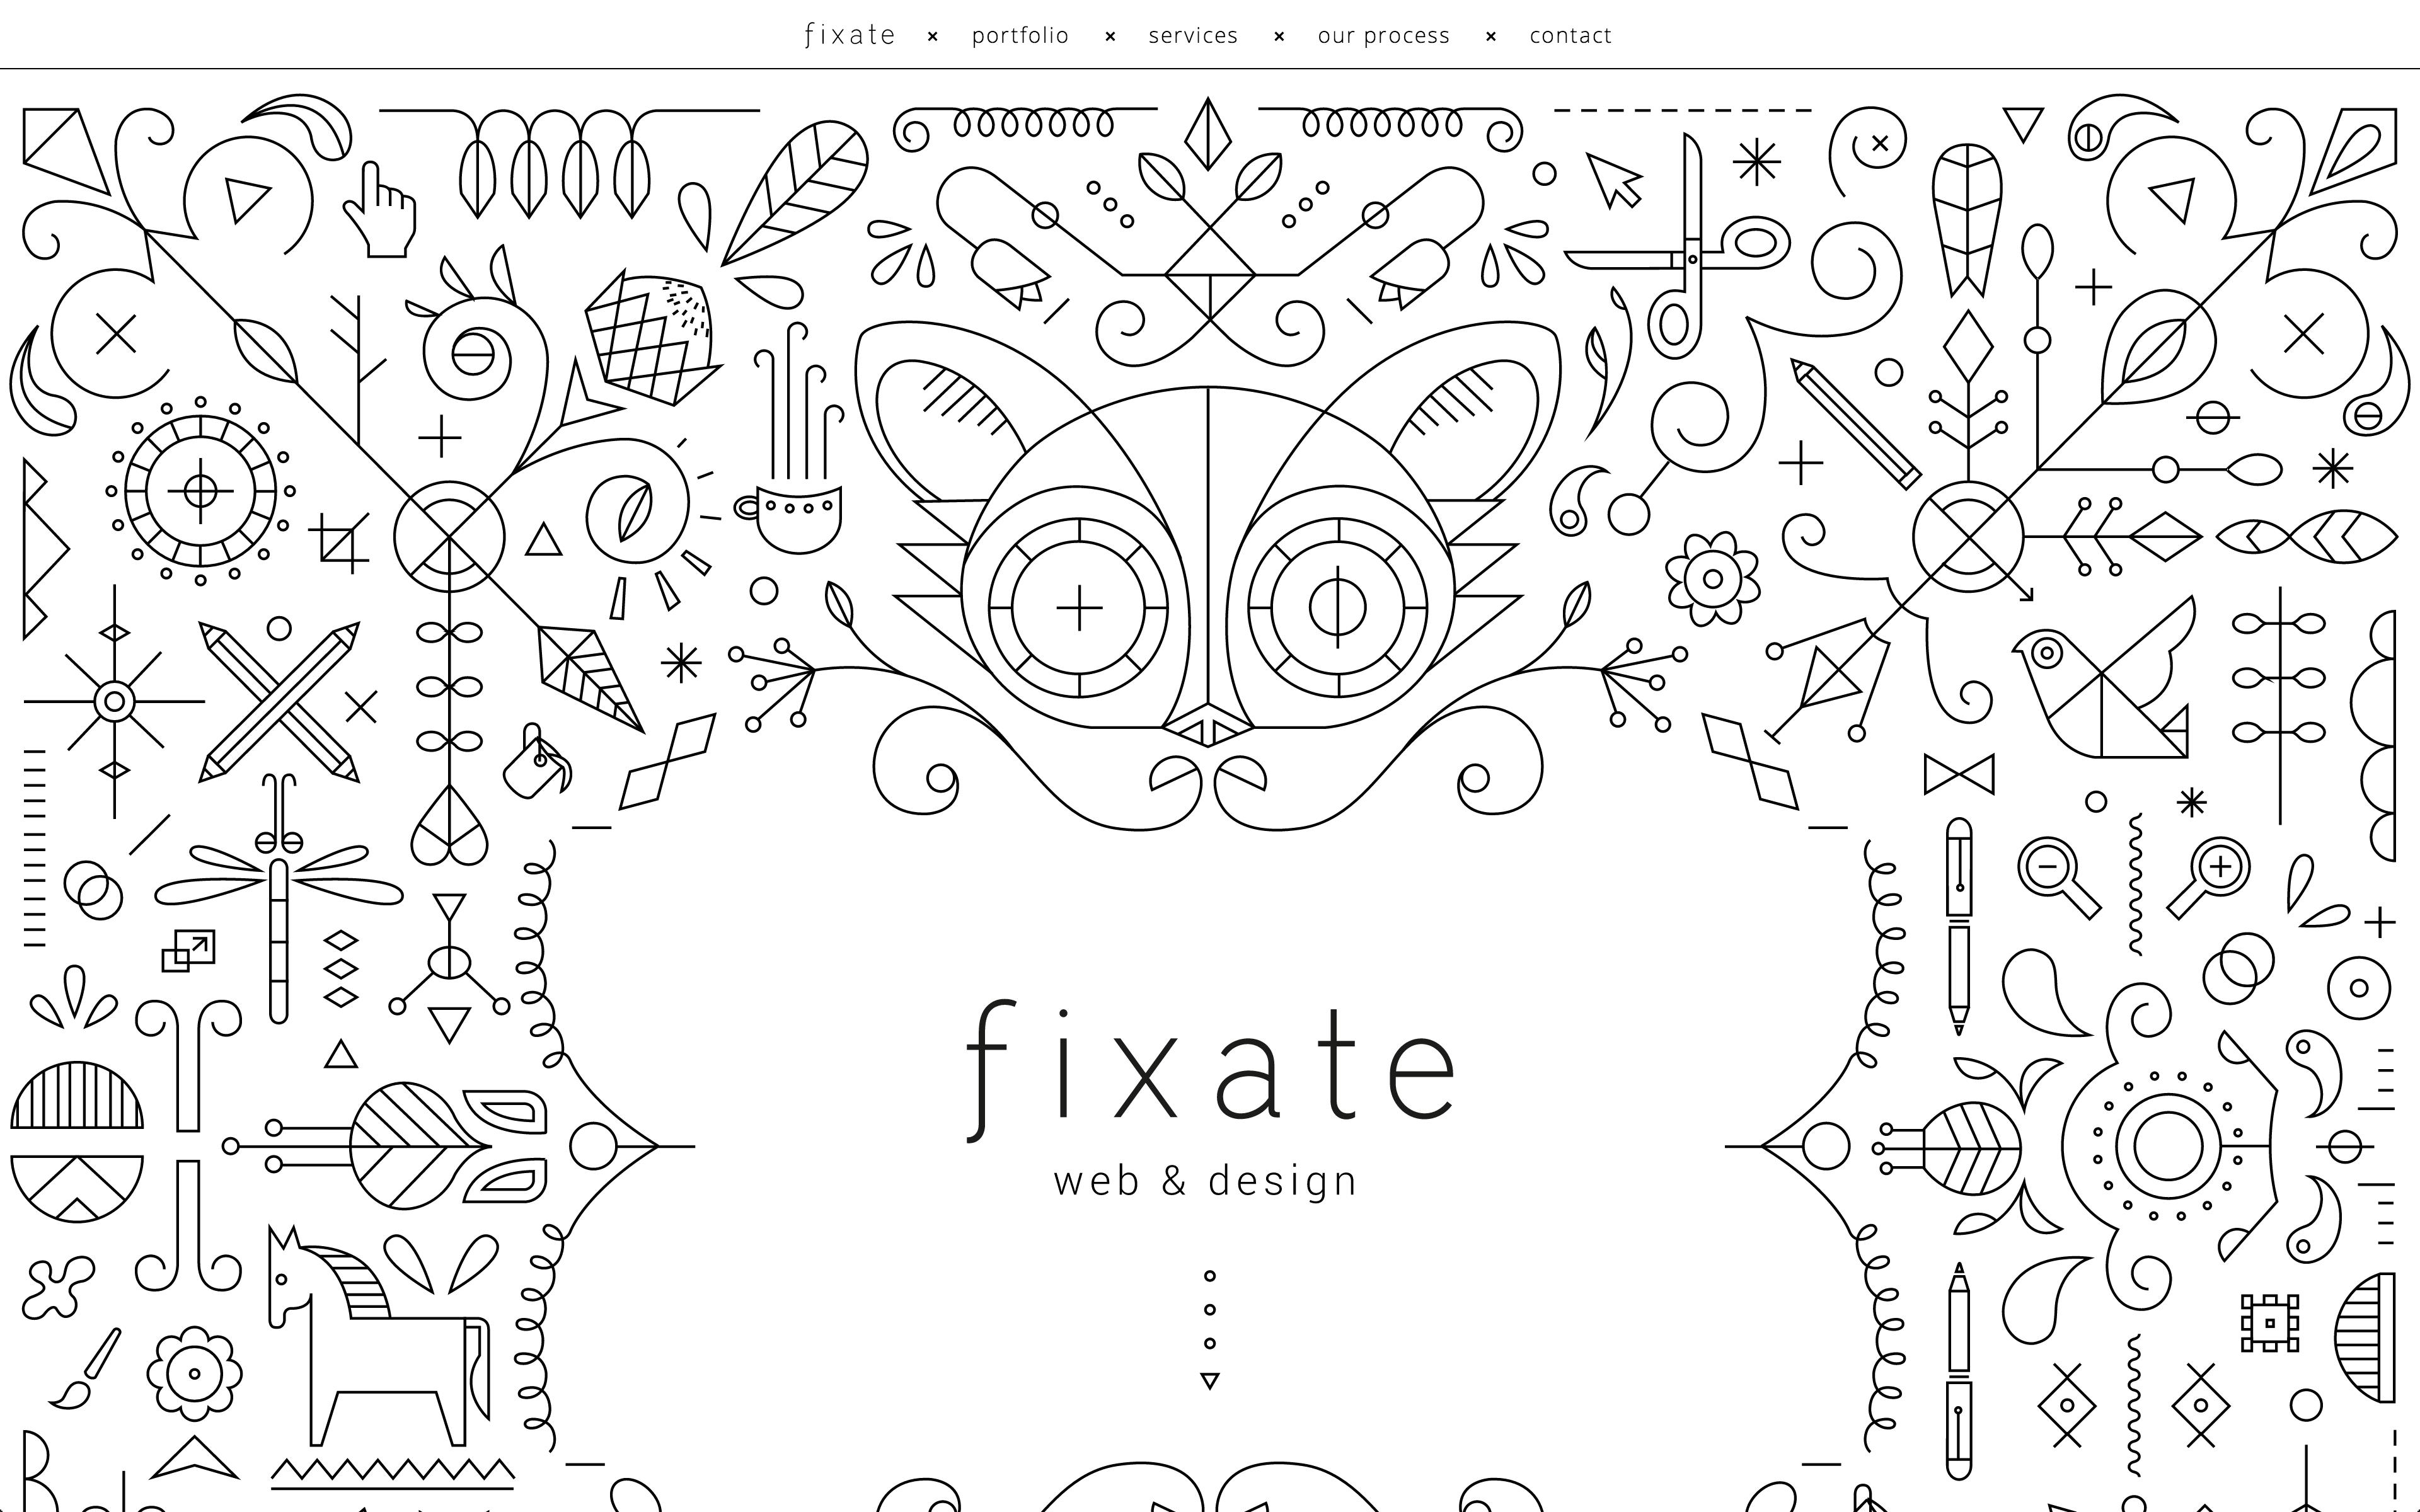 Fixate the best website design iuve seen in ages web